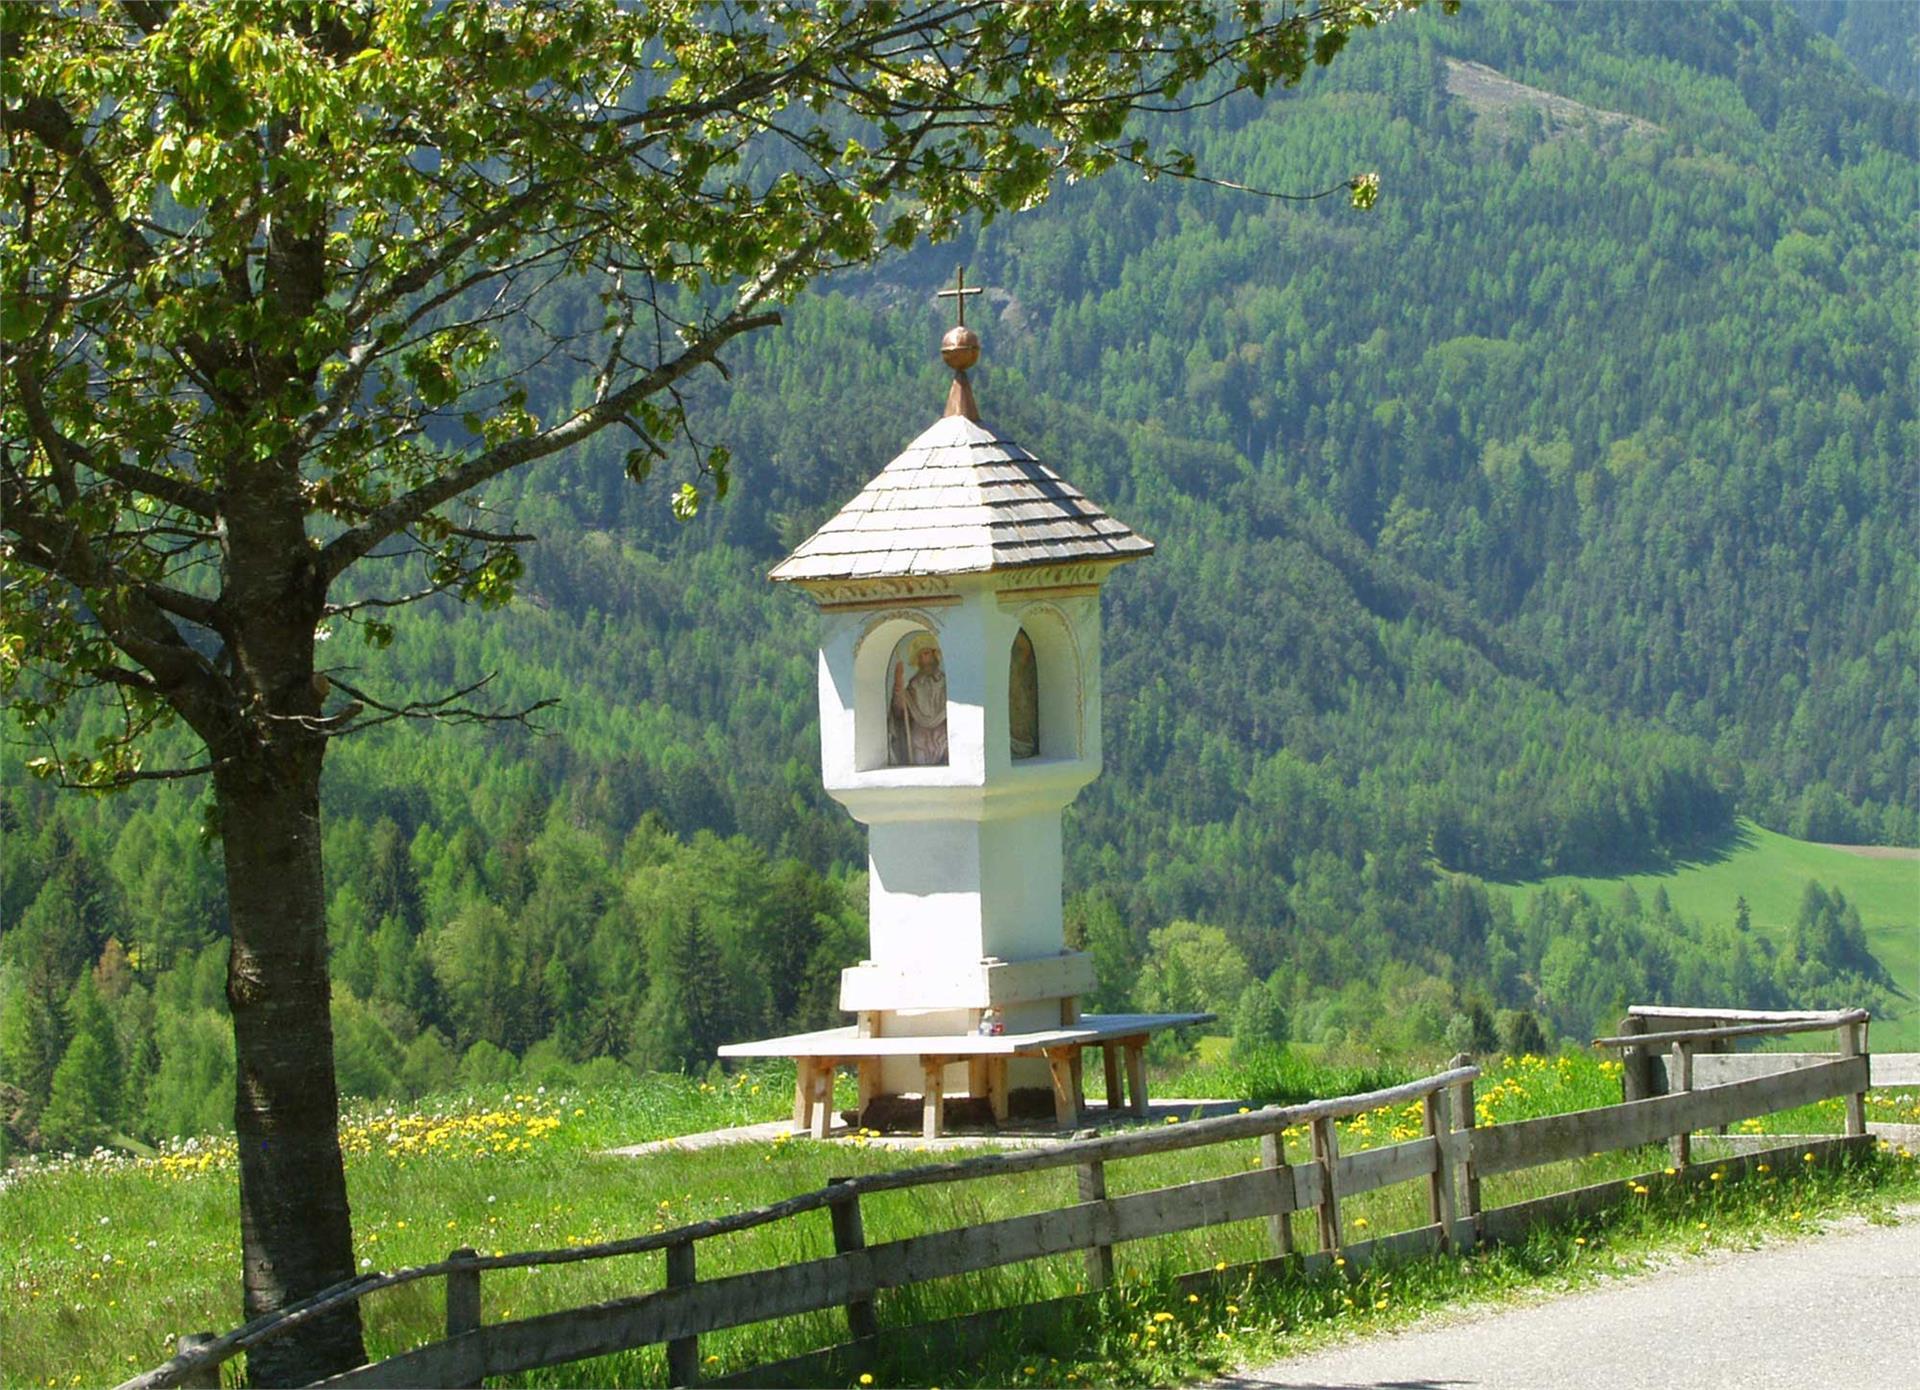 Wayside shrine at the sun trail